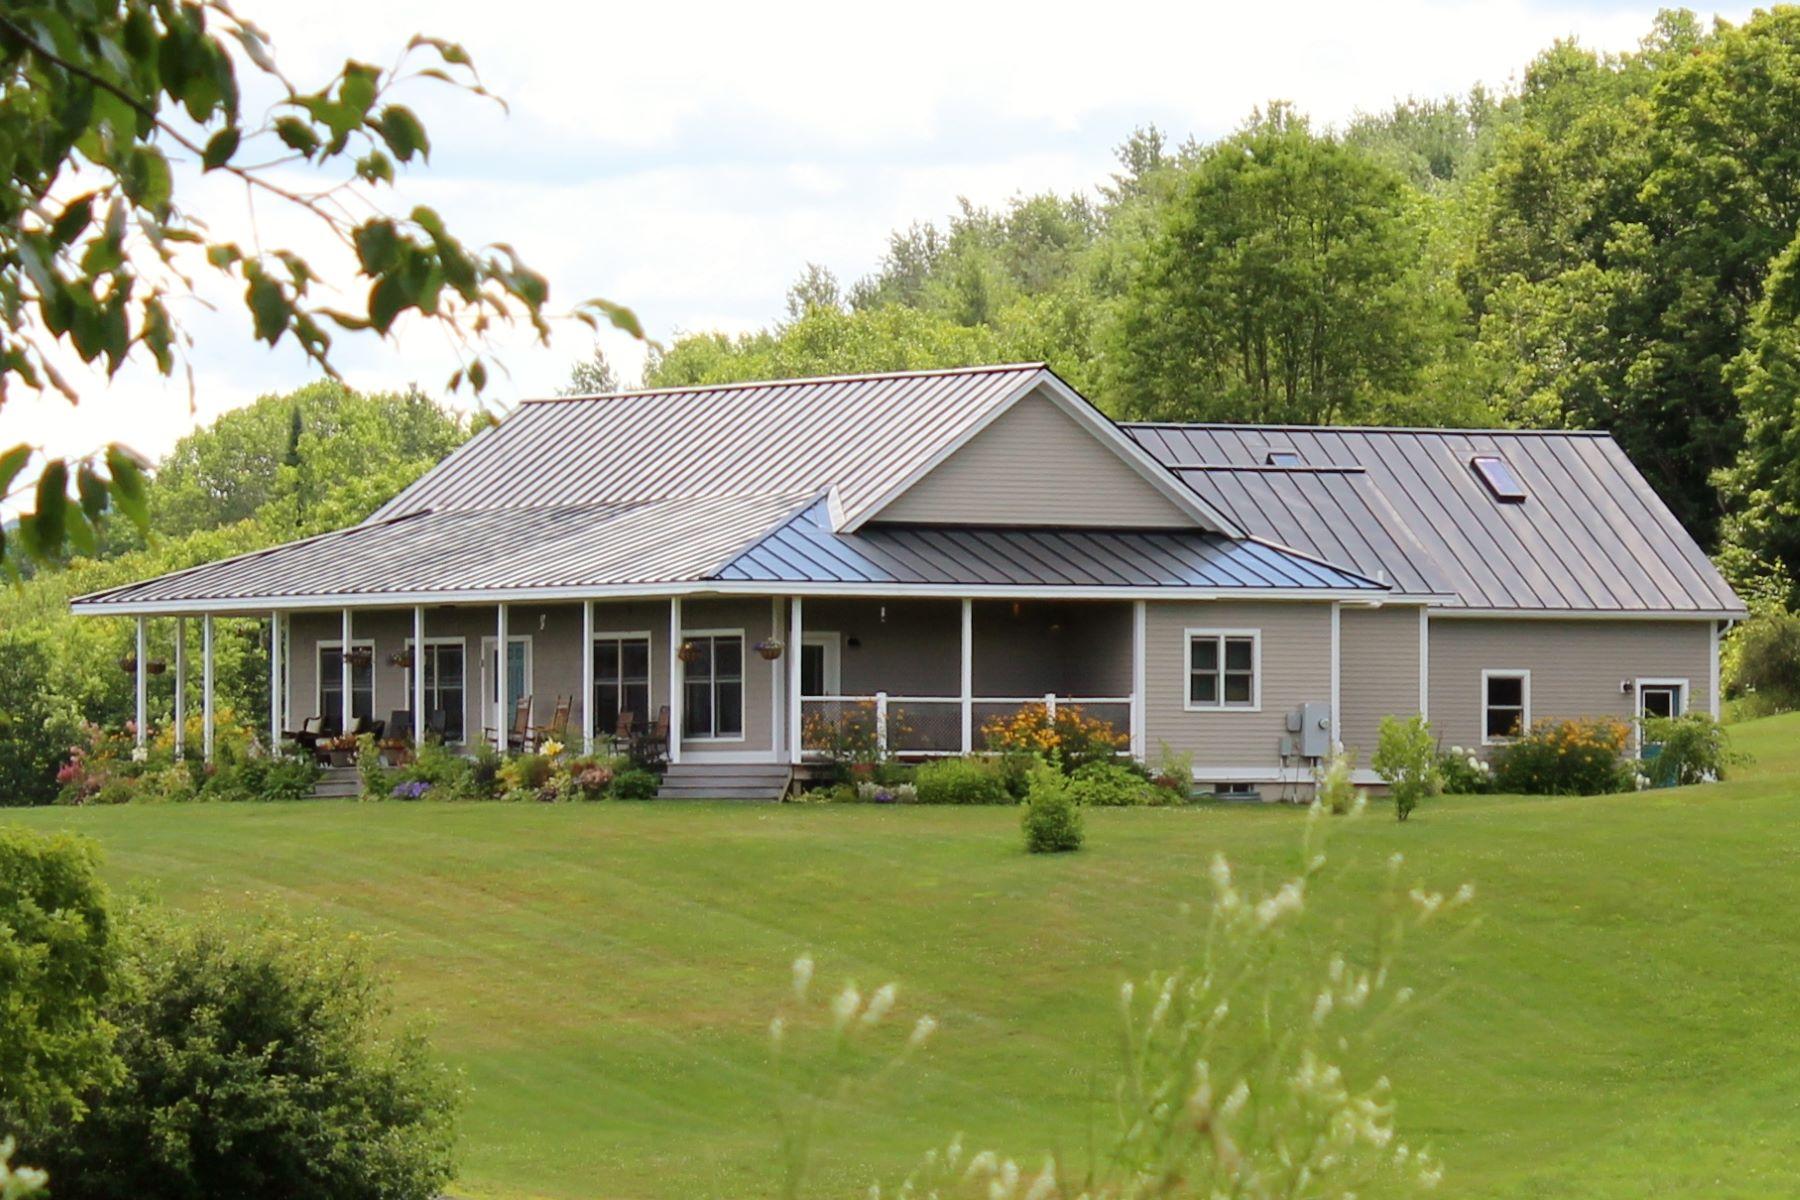 獨棟家庭住宅 為 出售 在 Gorgeous views, one-level living, small barn 254 Whitney Hill Rd Tunbridge, 佛蒙特州, 05077 美國